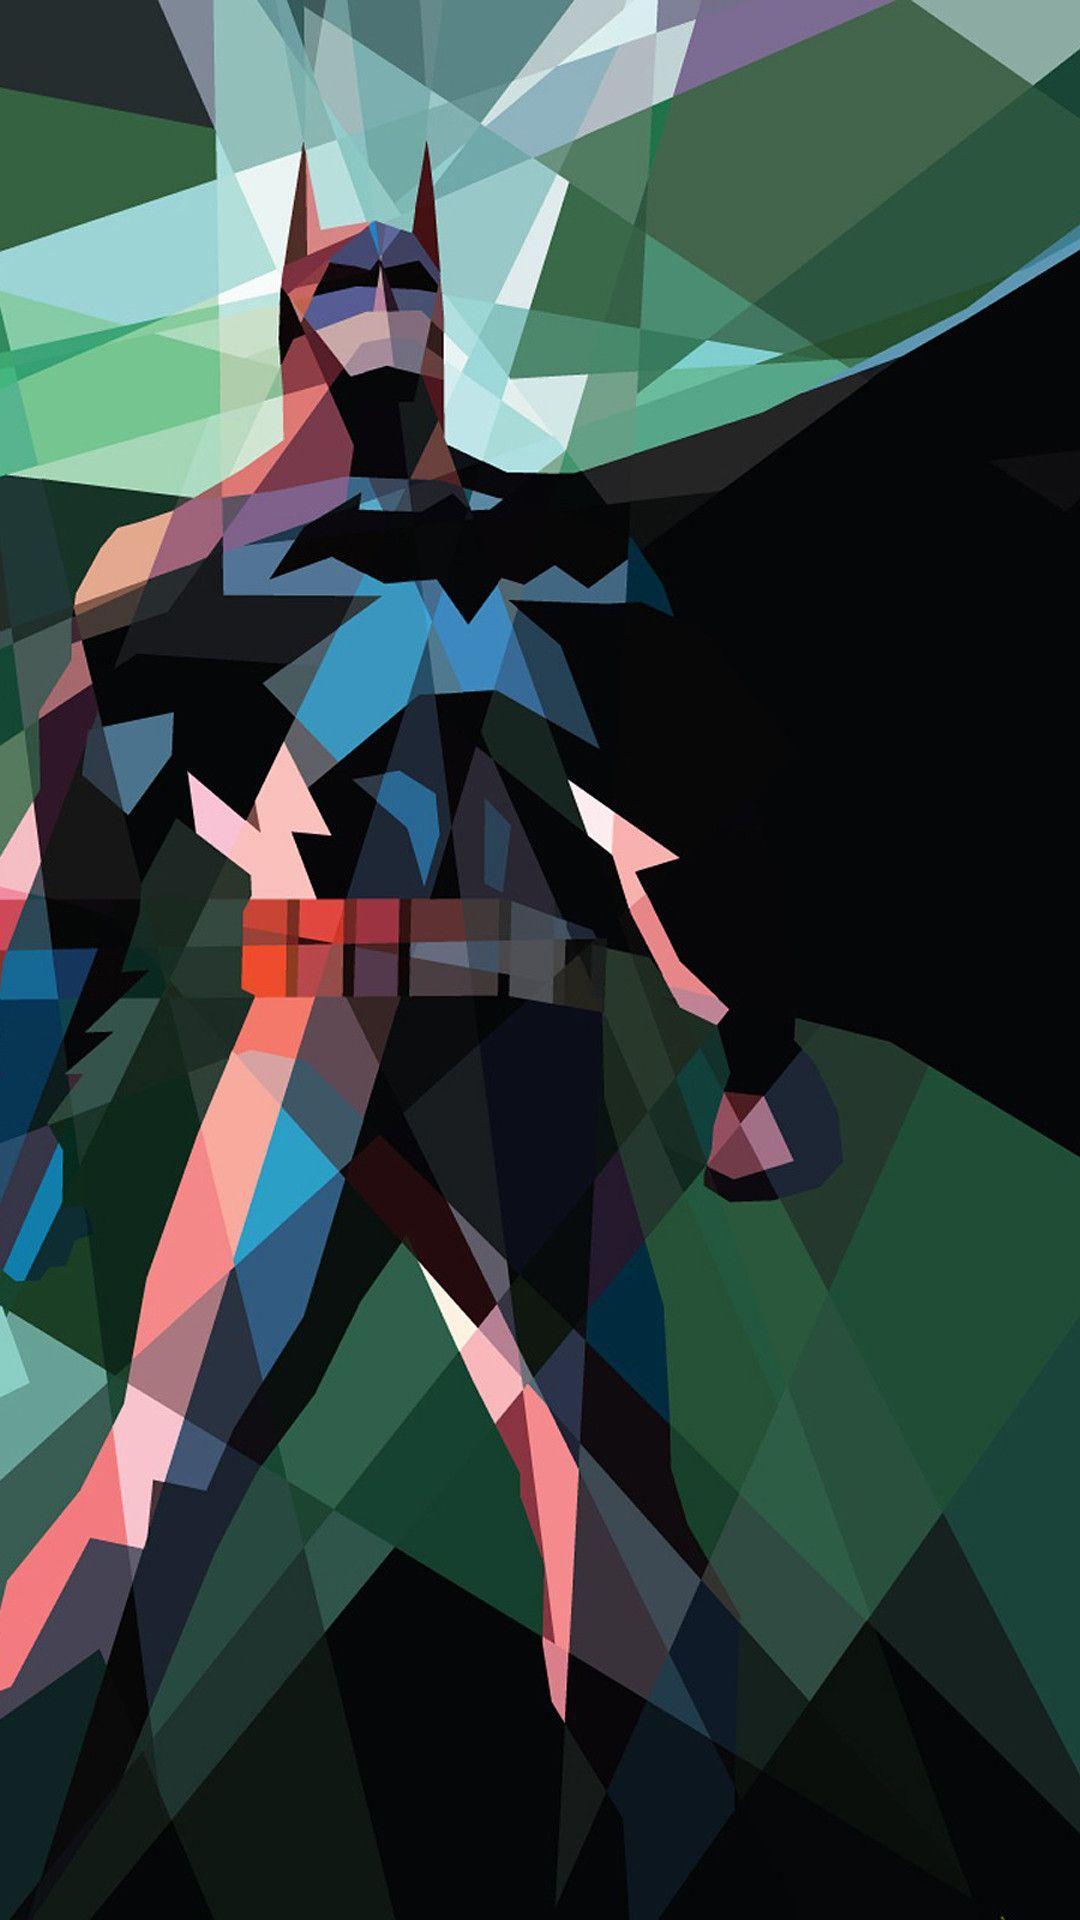 Superhero Hd Phone Wallpapers Top Free Superhero Hd Phone Backgrounds Wallpaperaccess